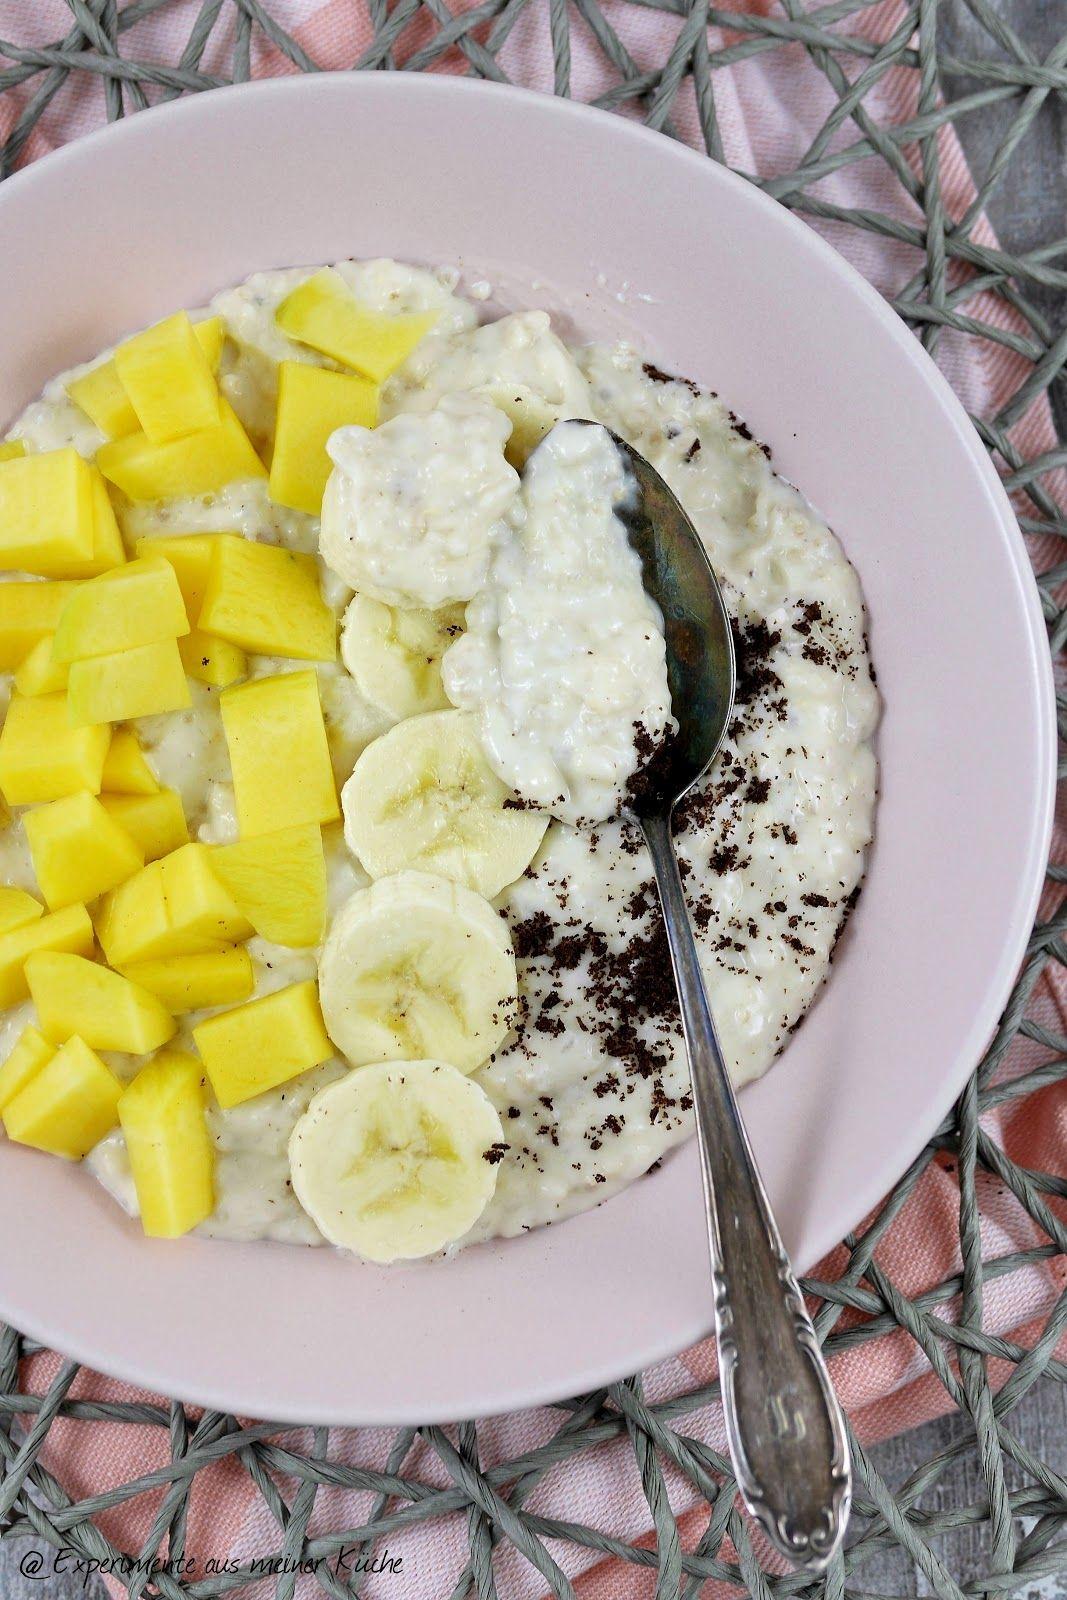 Pudding-Oats | WW | Pinterest | Experimente aus meiner küche ...